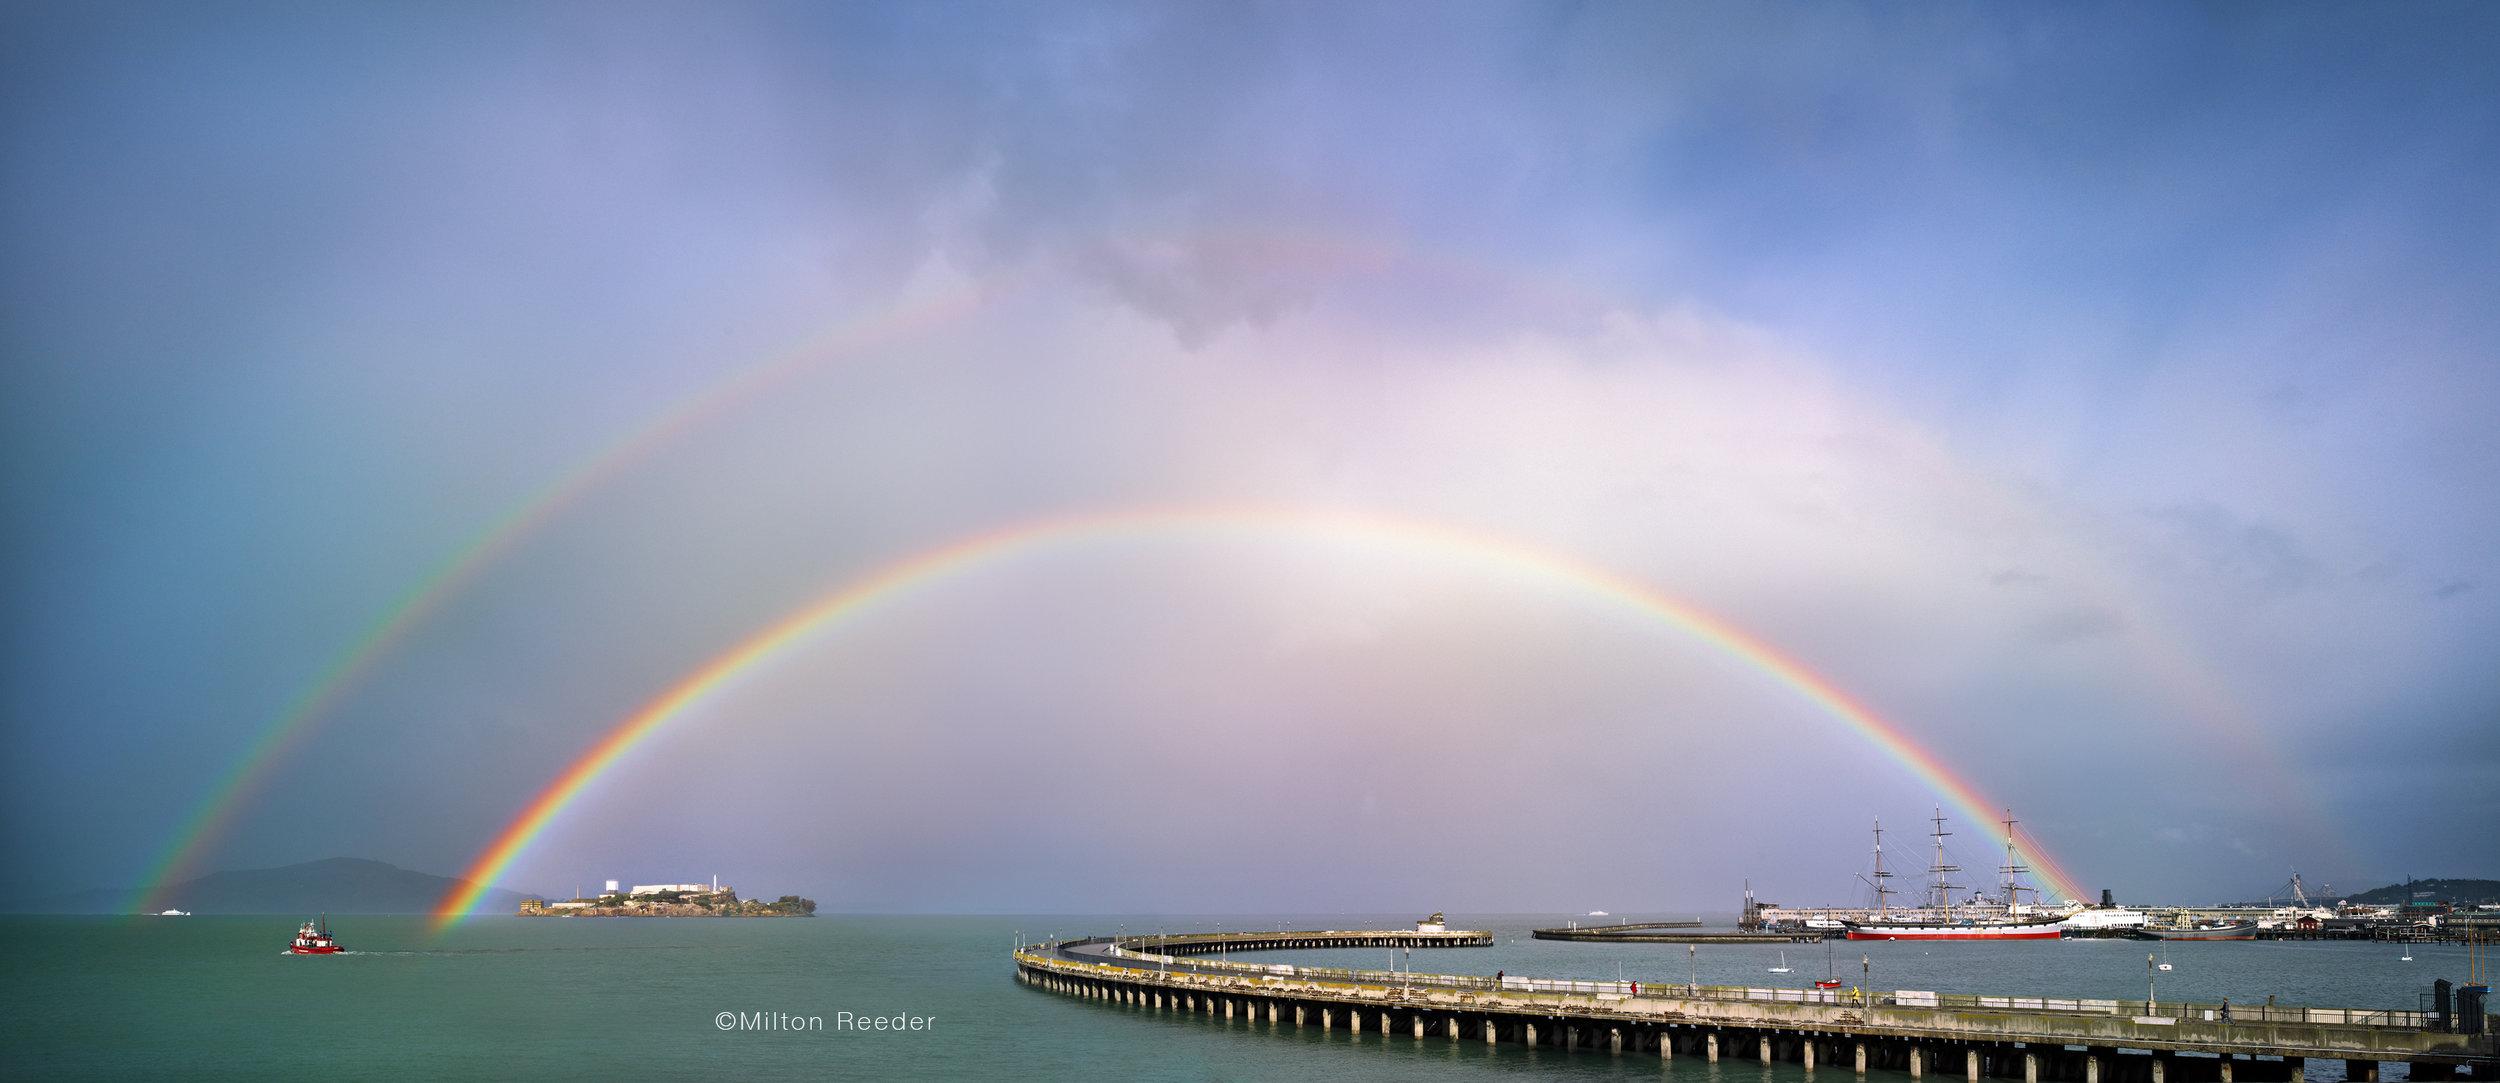 RainbowsOverAlcatraz.jpg